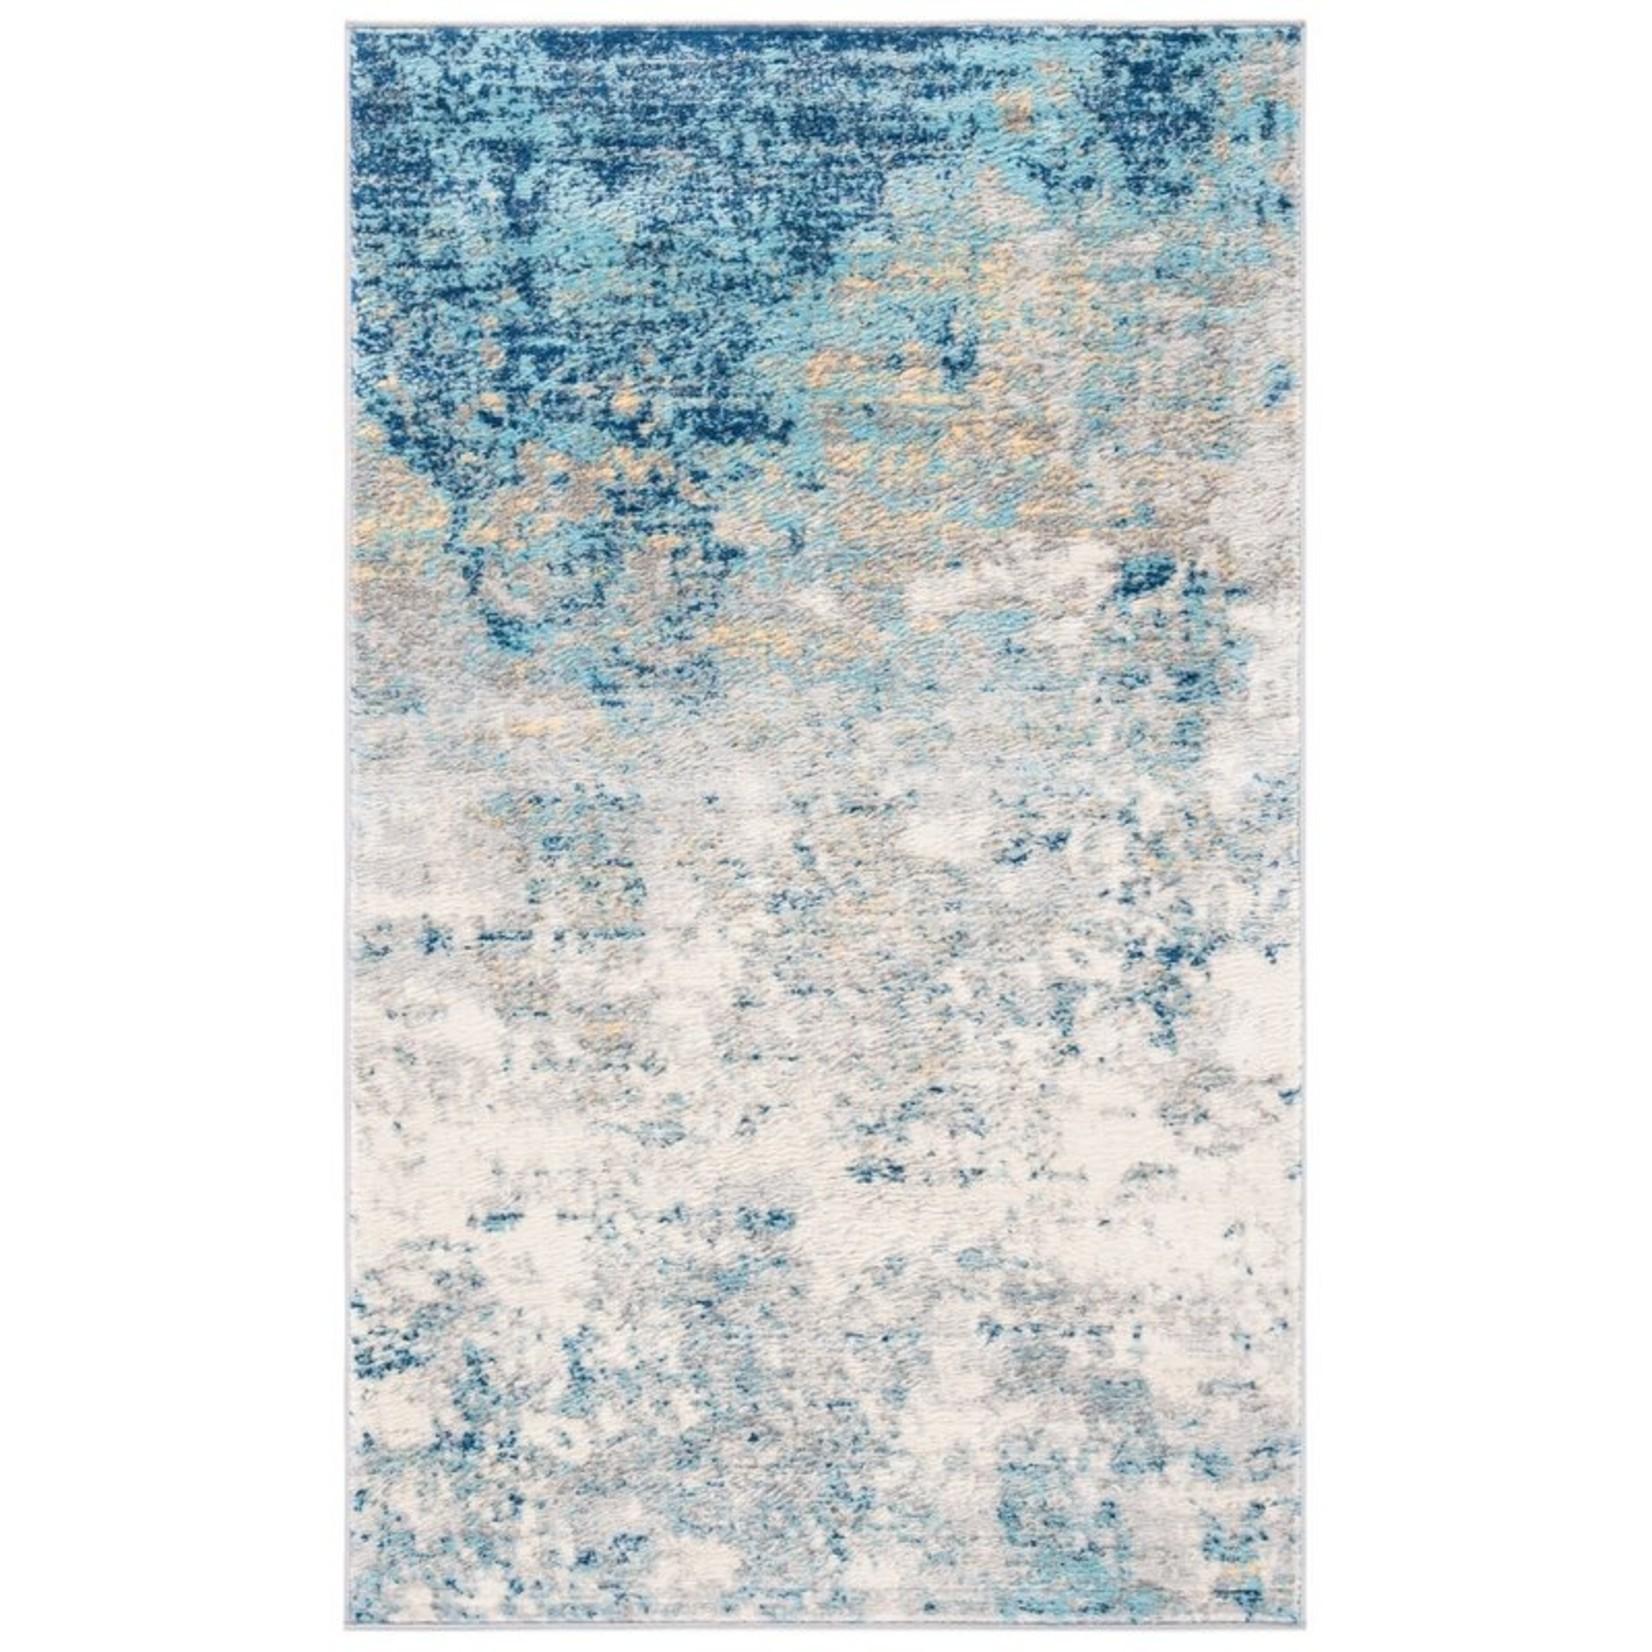 *3' x 5' - N'Keal Light Gray/Blue Rug